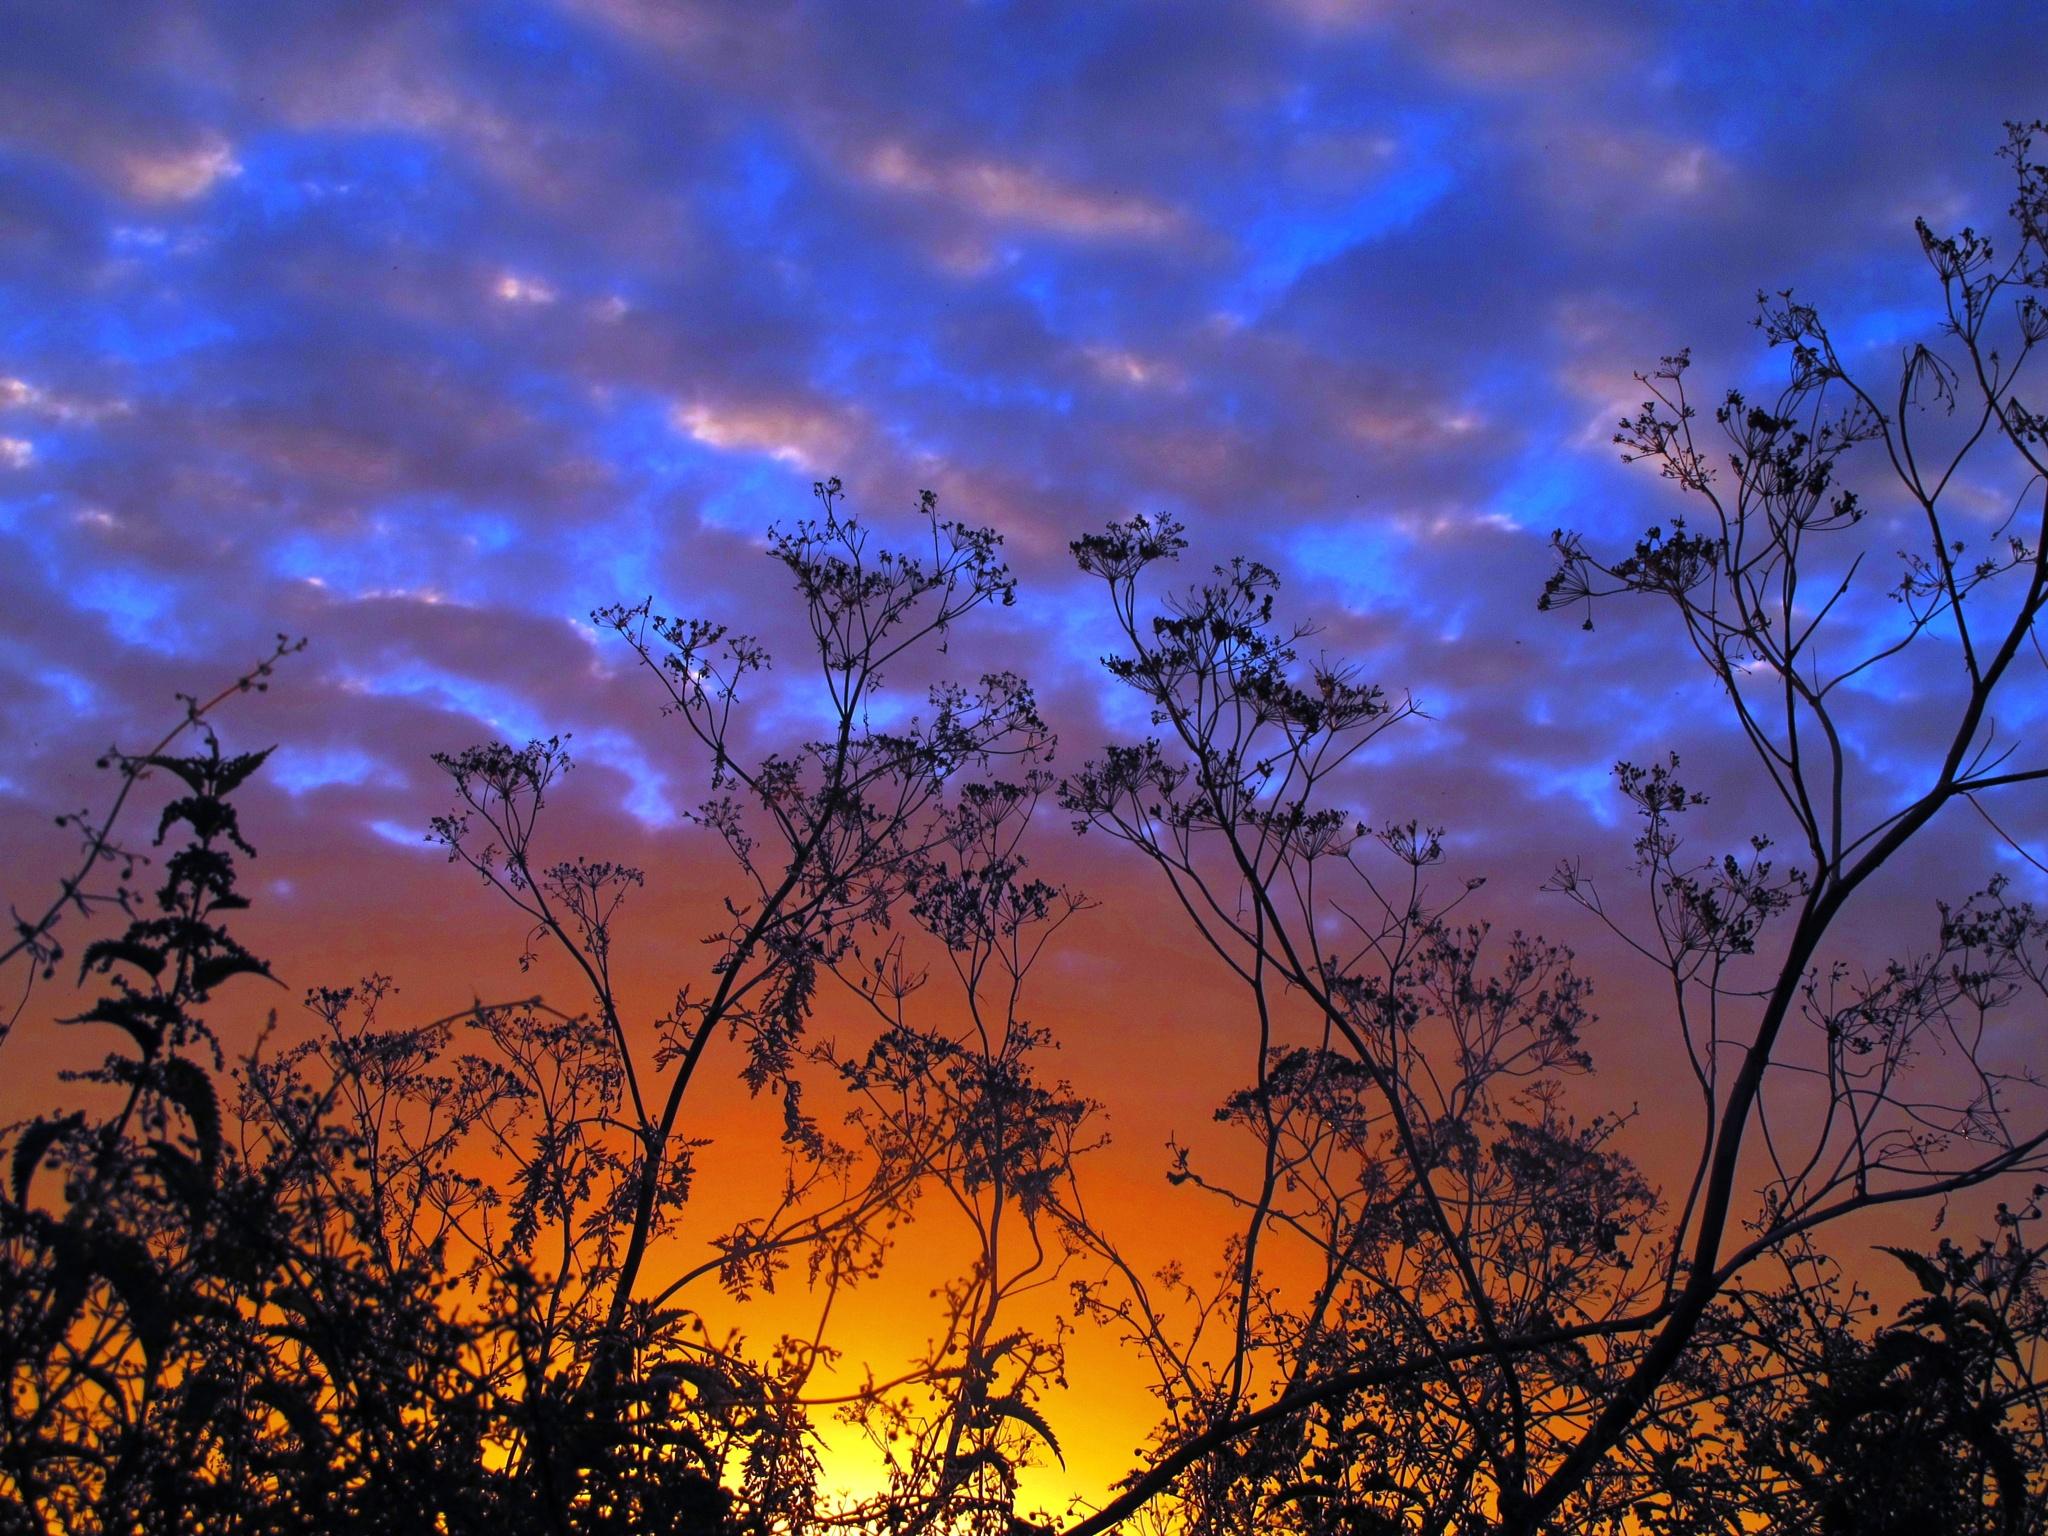 Sunset twigs by AJ Yakstrangler Andy Jamieson